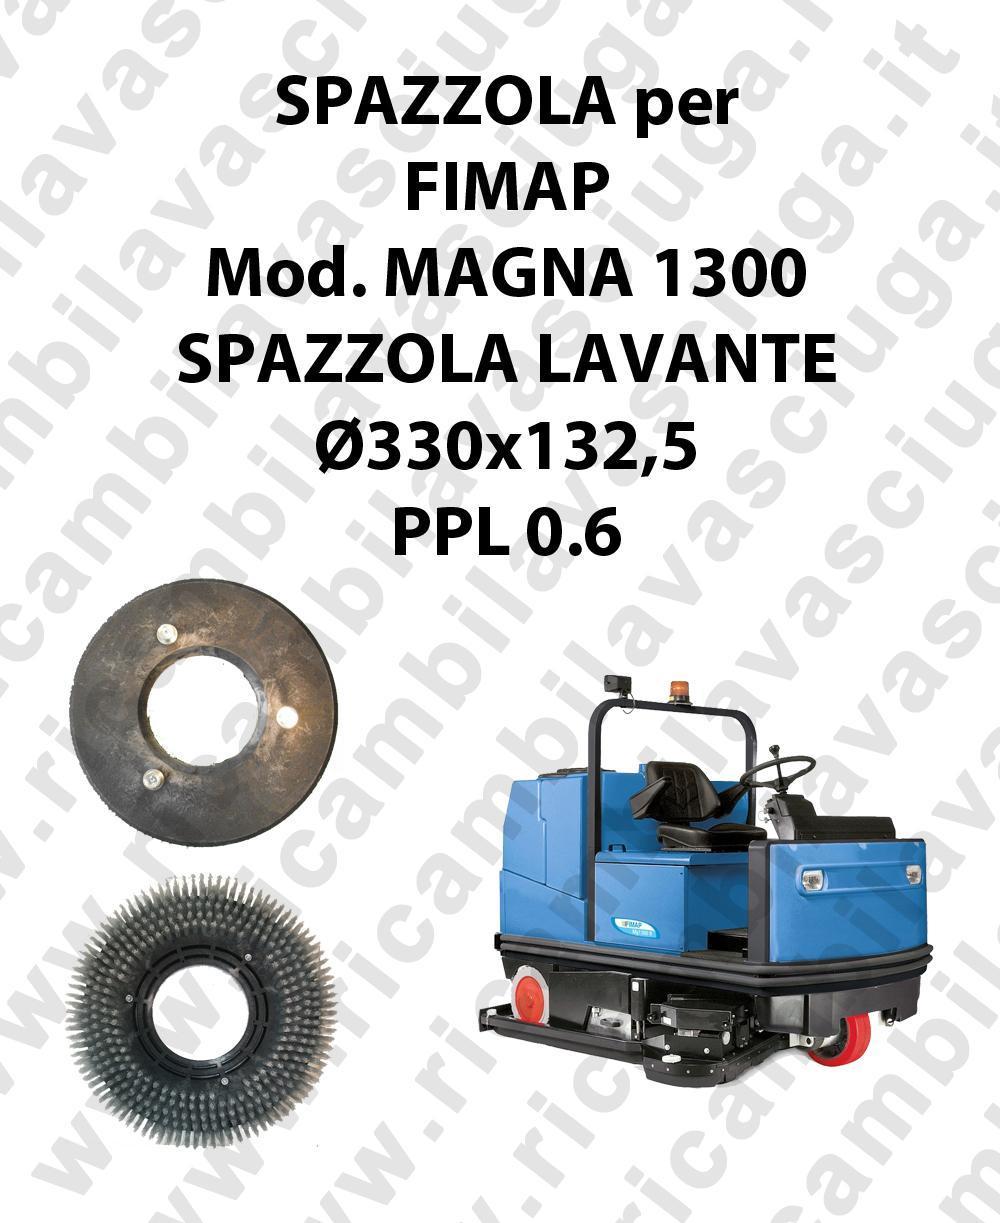 STANDARD BRUSH  for scrubber dryer FIMAP model MAGNA 1300 ⌀ 330 x 132.5 PPL 0.6